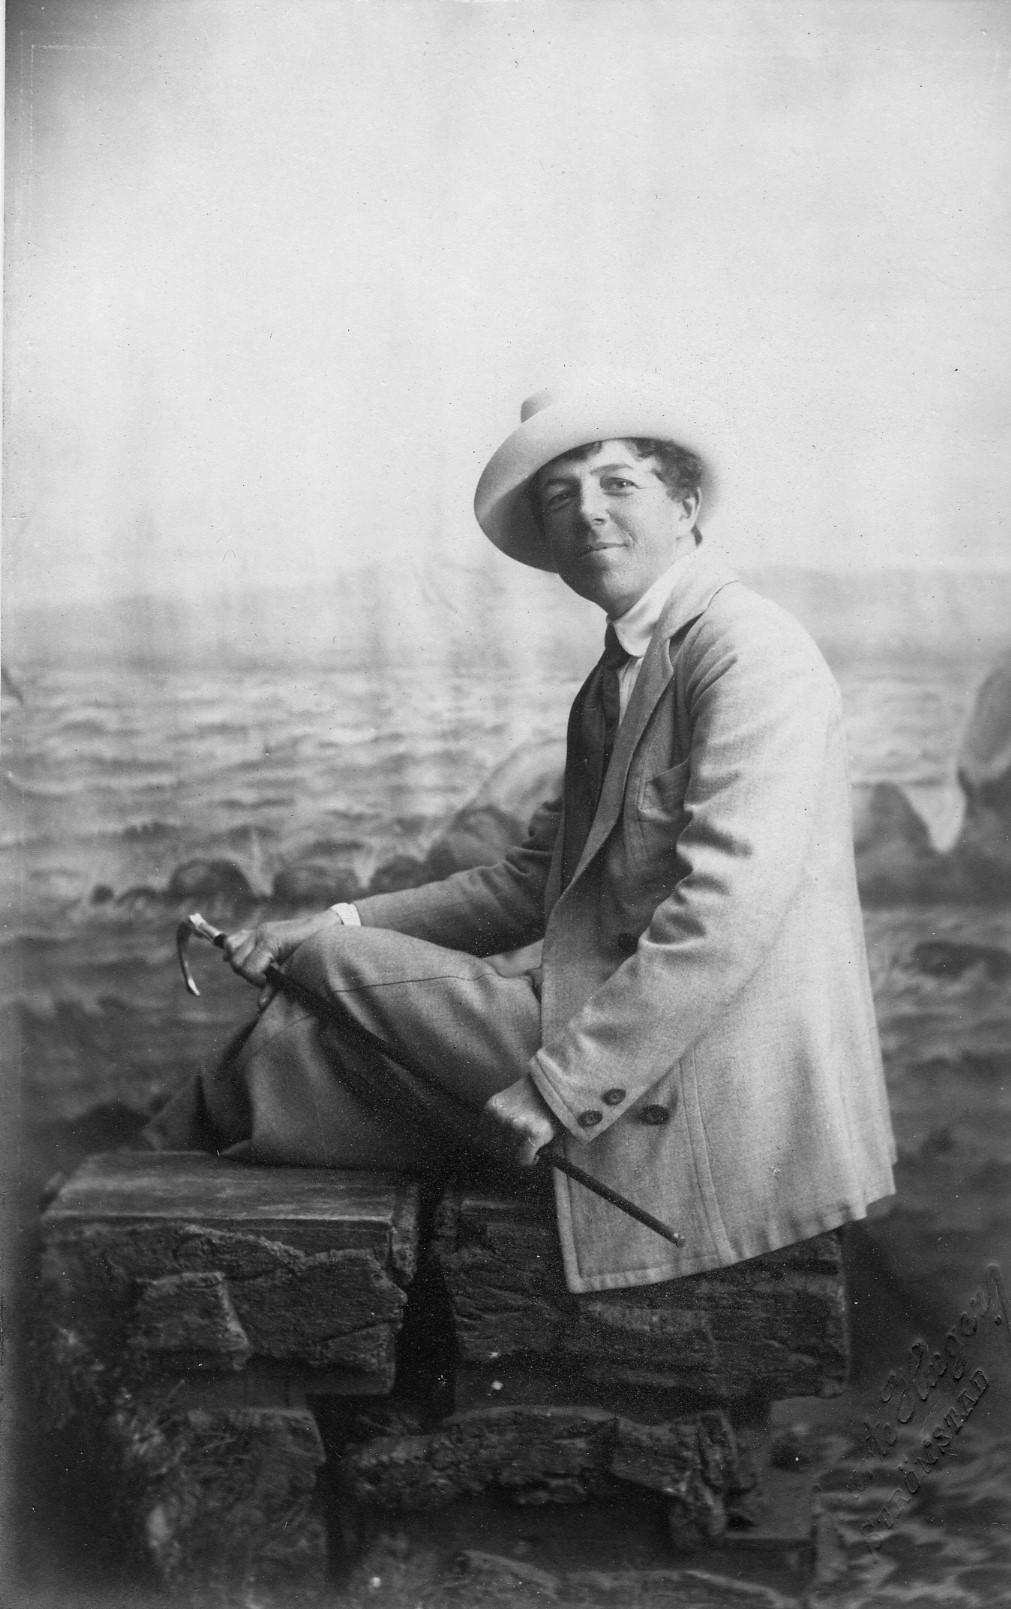 Janken Wiel-Hansen, circa 1910. Photo: Swante Haeger (1865-1915). Østfoldmuseene,  Halden historiske Samlinger